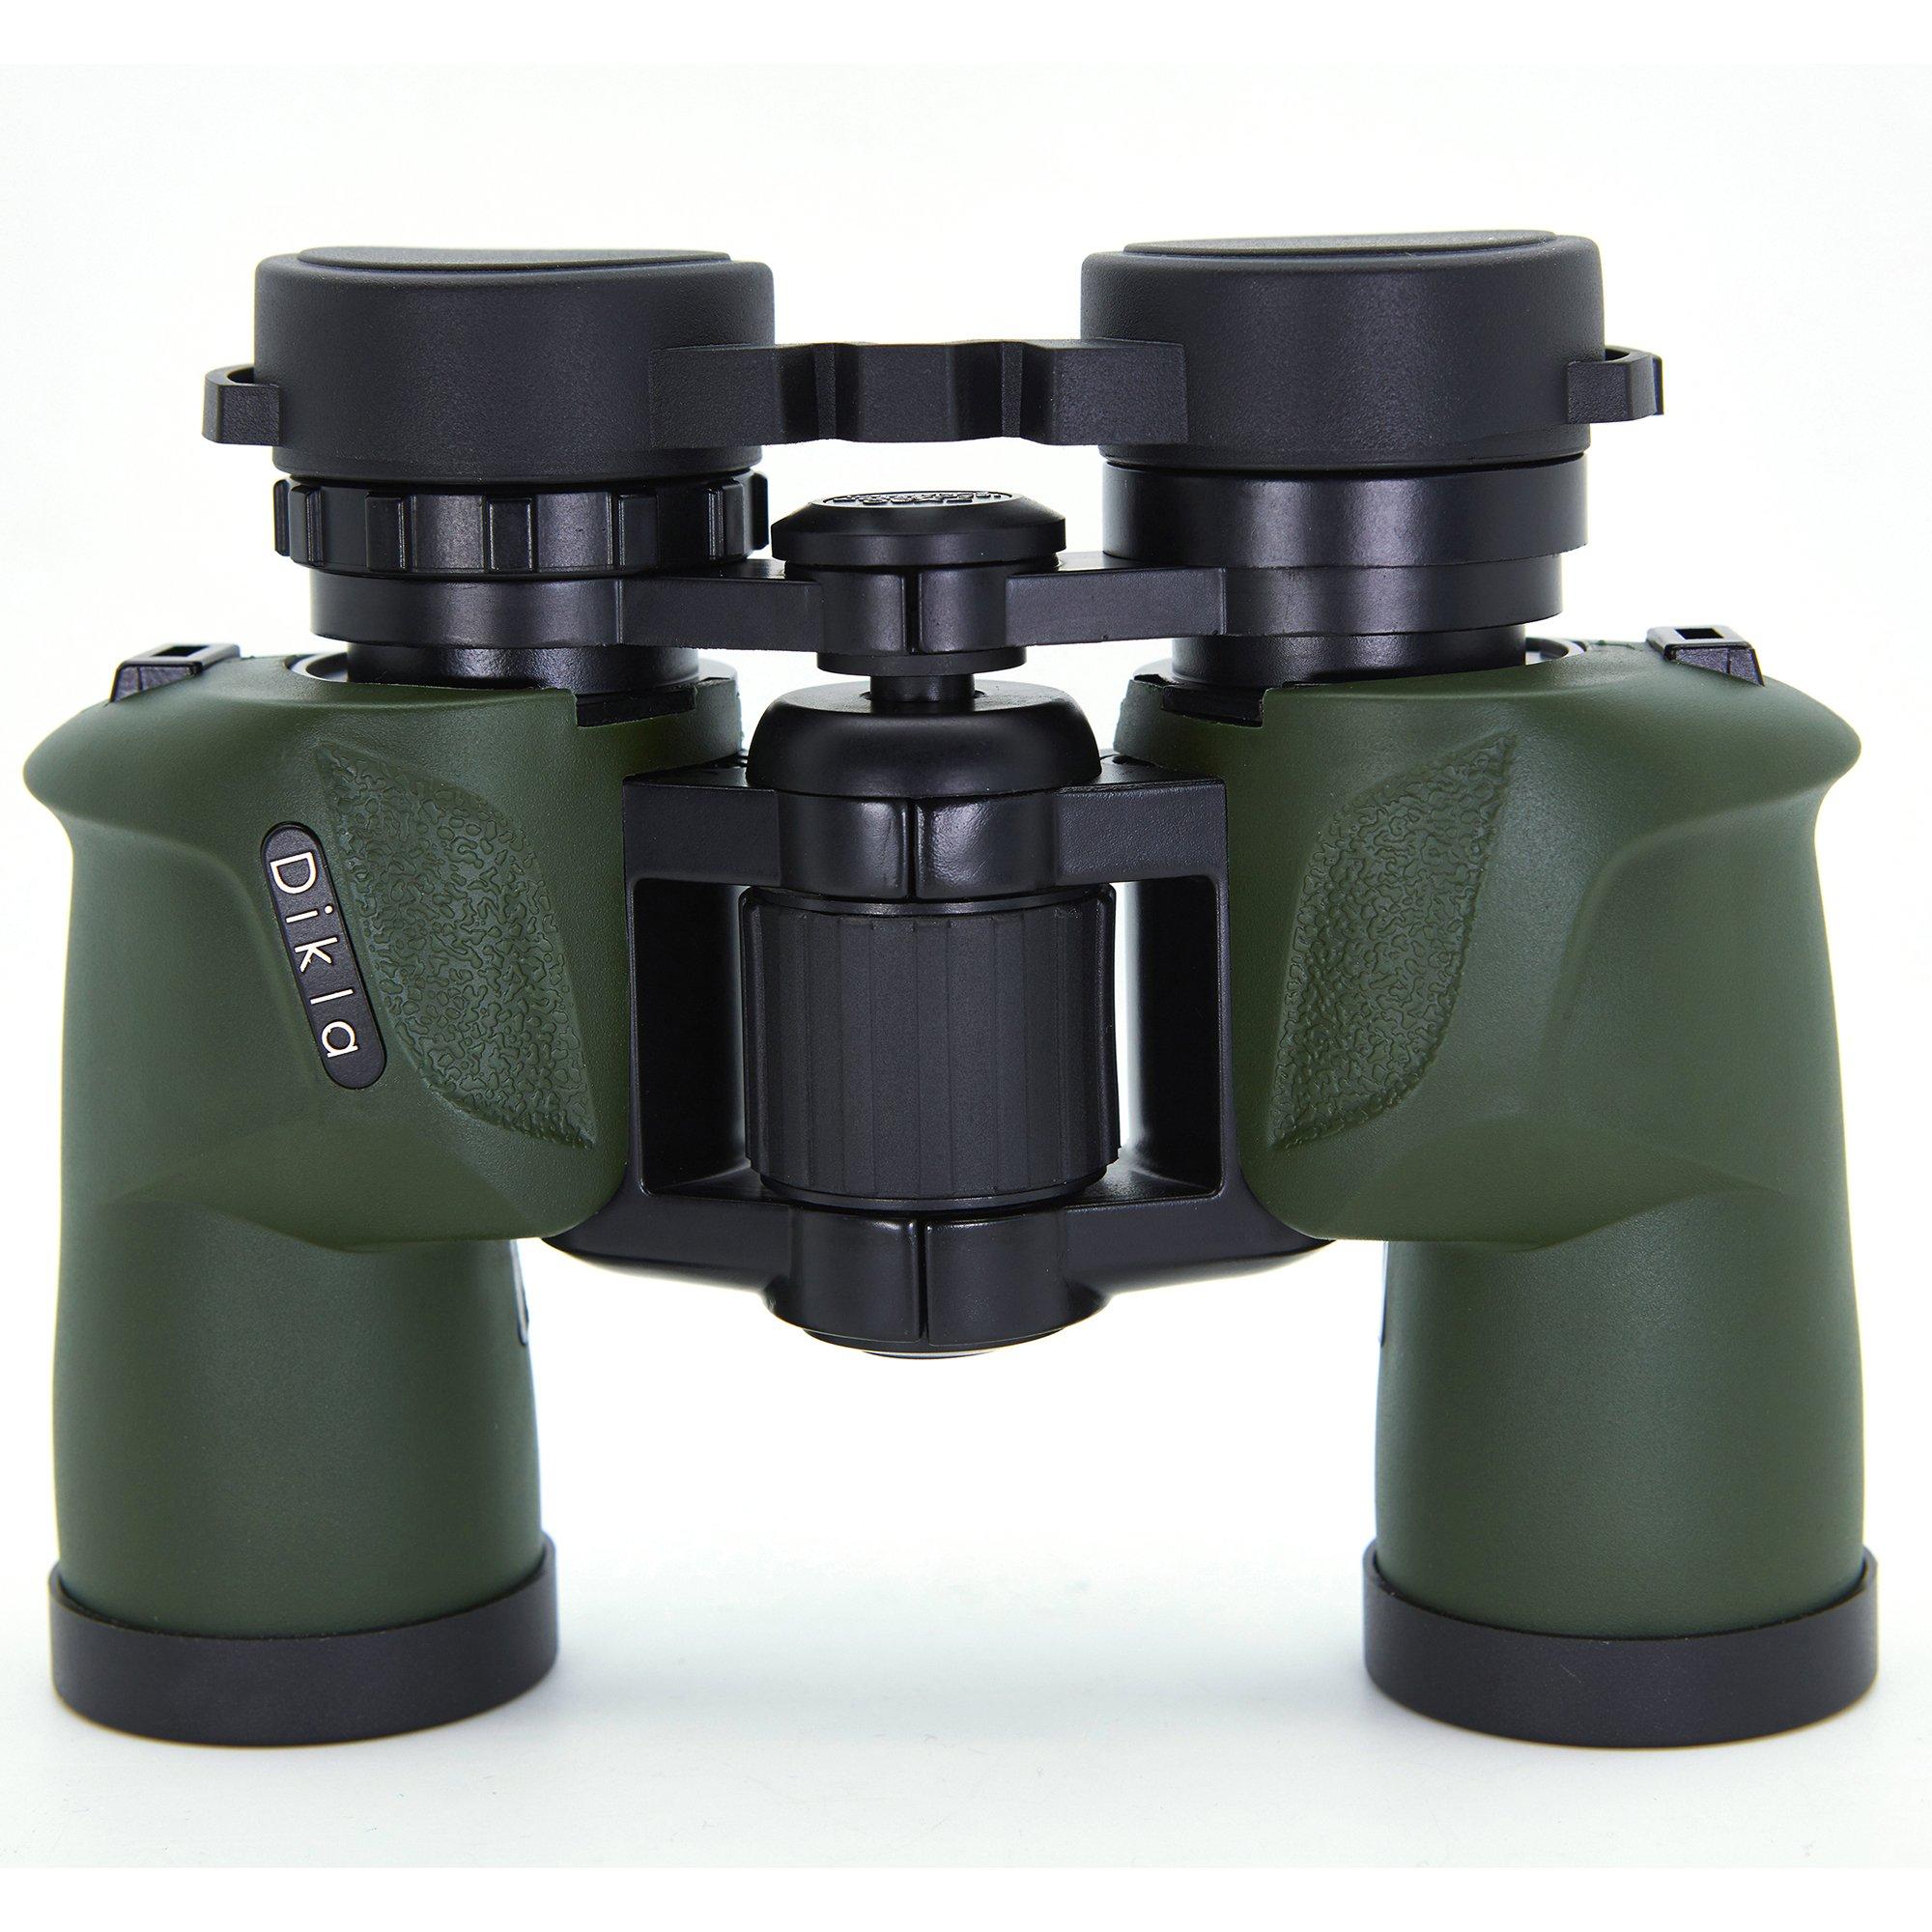 Binoculars For Adults 7x30 High Magnification Professional Powerful Binoculars For Kids Bird Watching Binocular Hunting Army Green by DIKLA